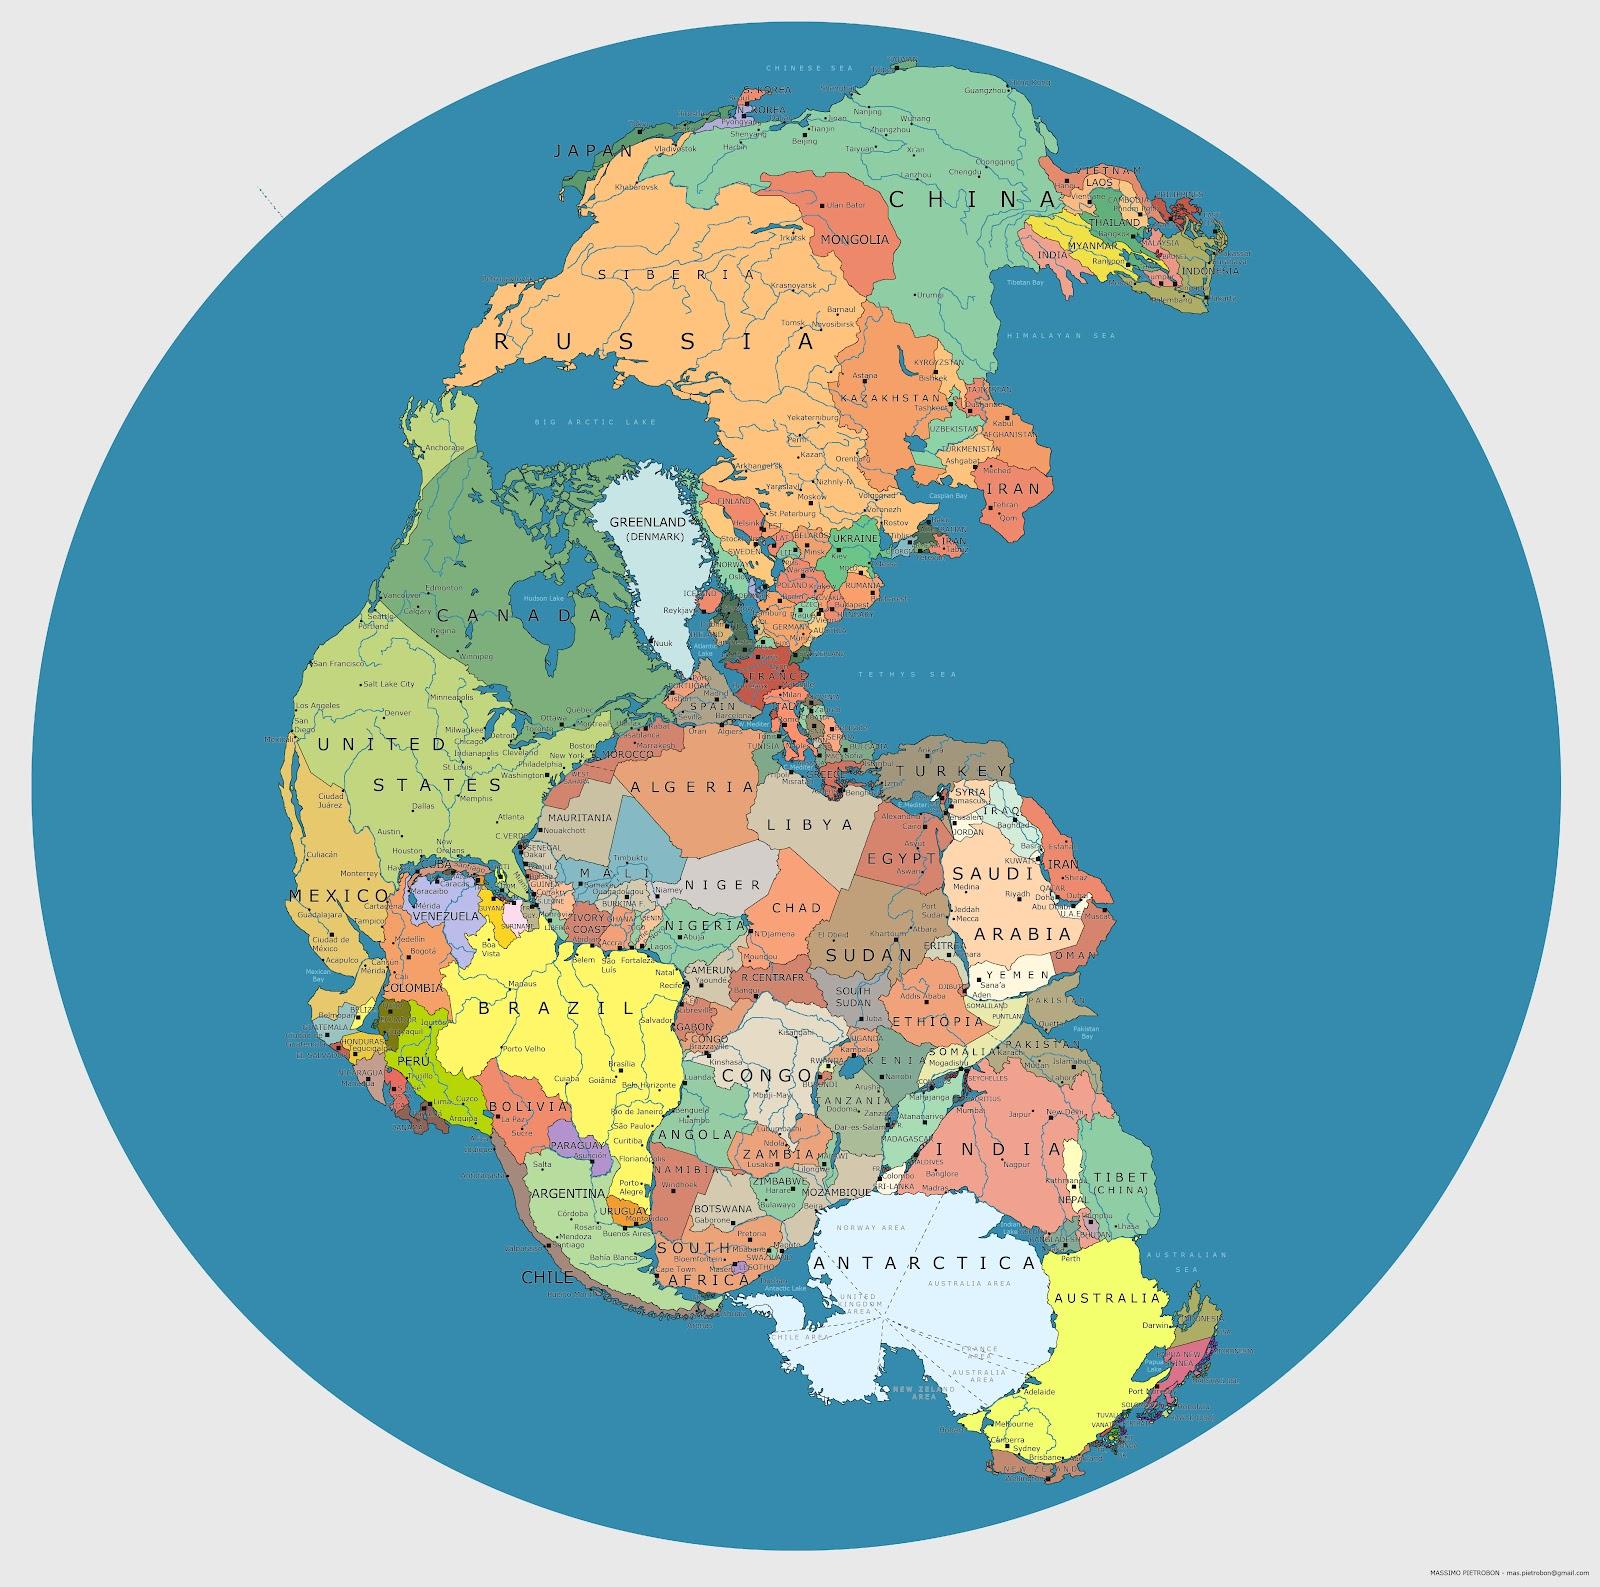 Supercontinente Pangeia